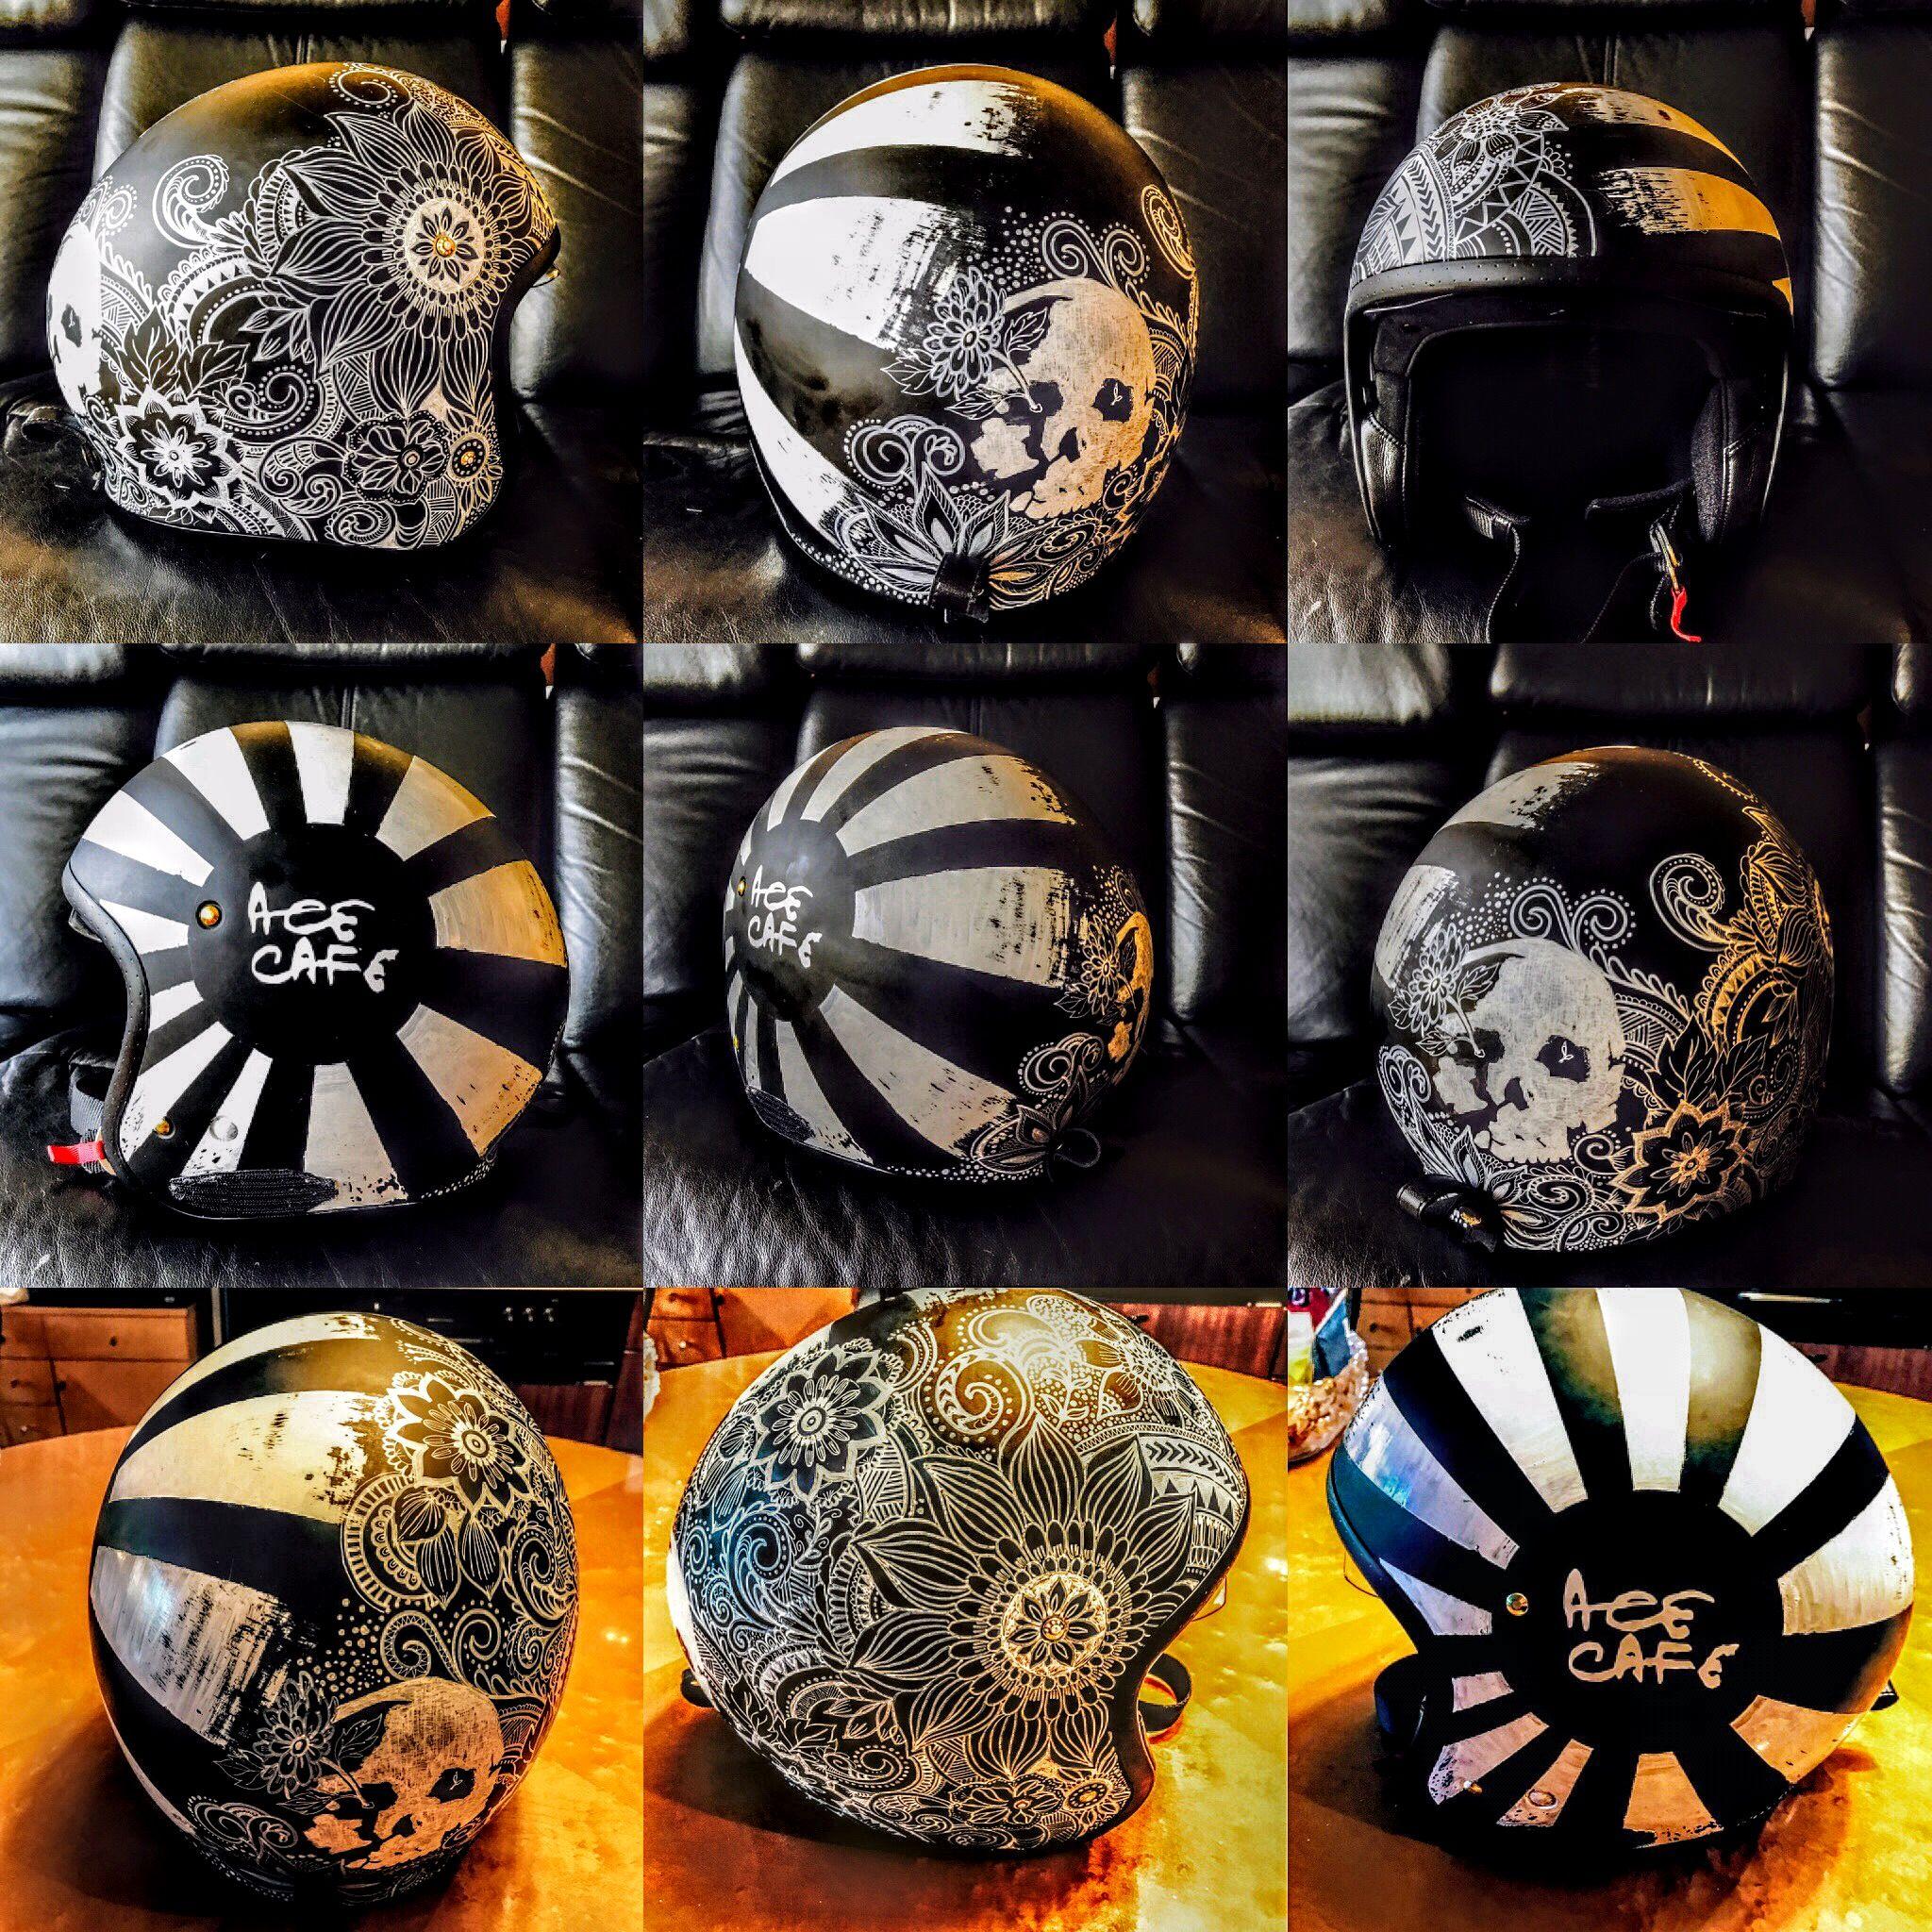 Custom Helmets Gear Inspiration Bobber Chopper Motorcycles Old School Vintage Style Bike Art Motorcycle Helmets Motorcycle Helmet Design Custom Helmets